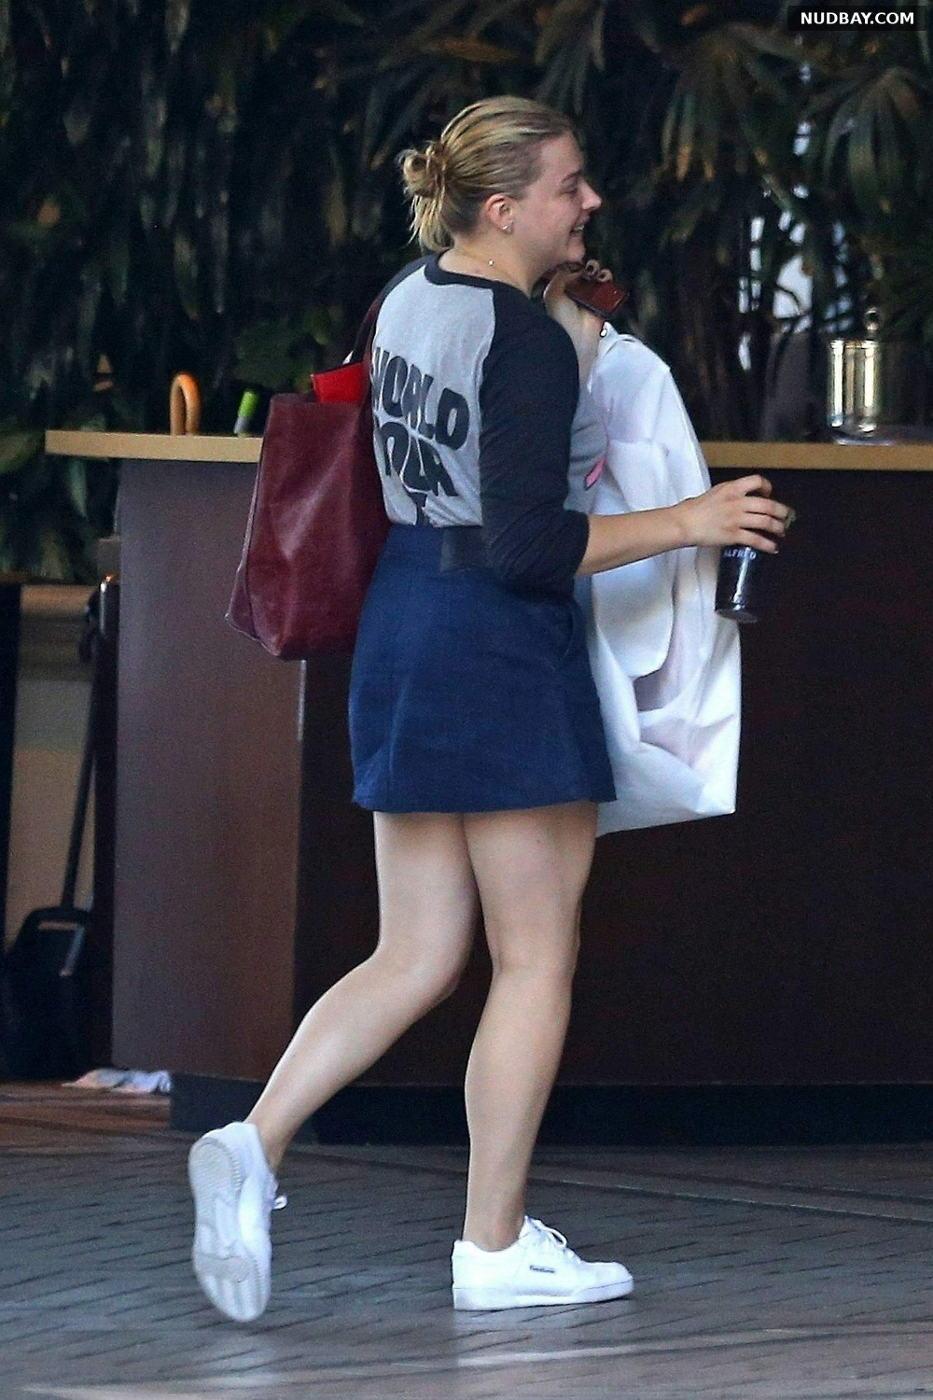 Chloe Grace Moretz arrives at The Four Seasons in Beverly Hills California Jul 23 2018